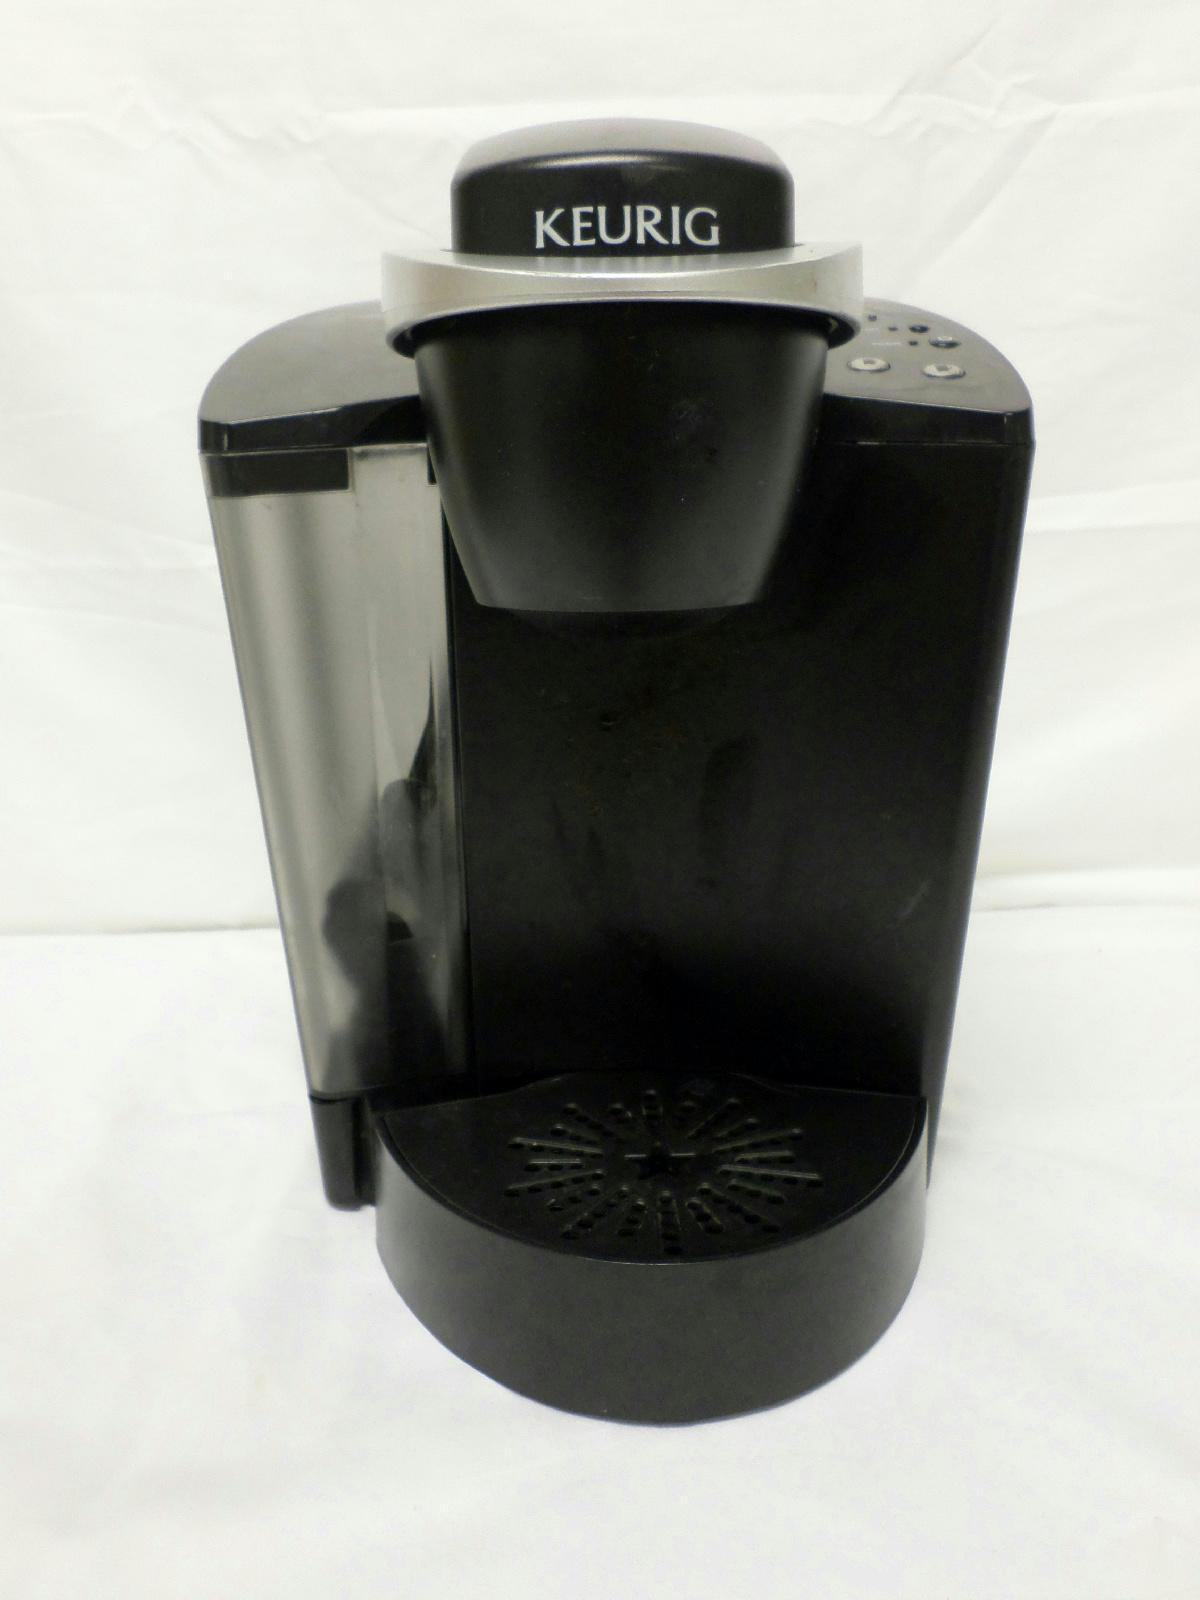 Keurig B40 Coffee Maker Special Edition Brewing System Black